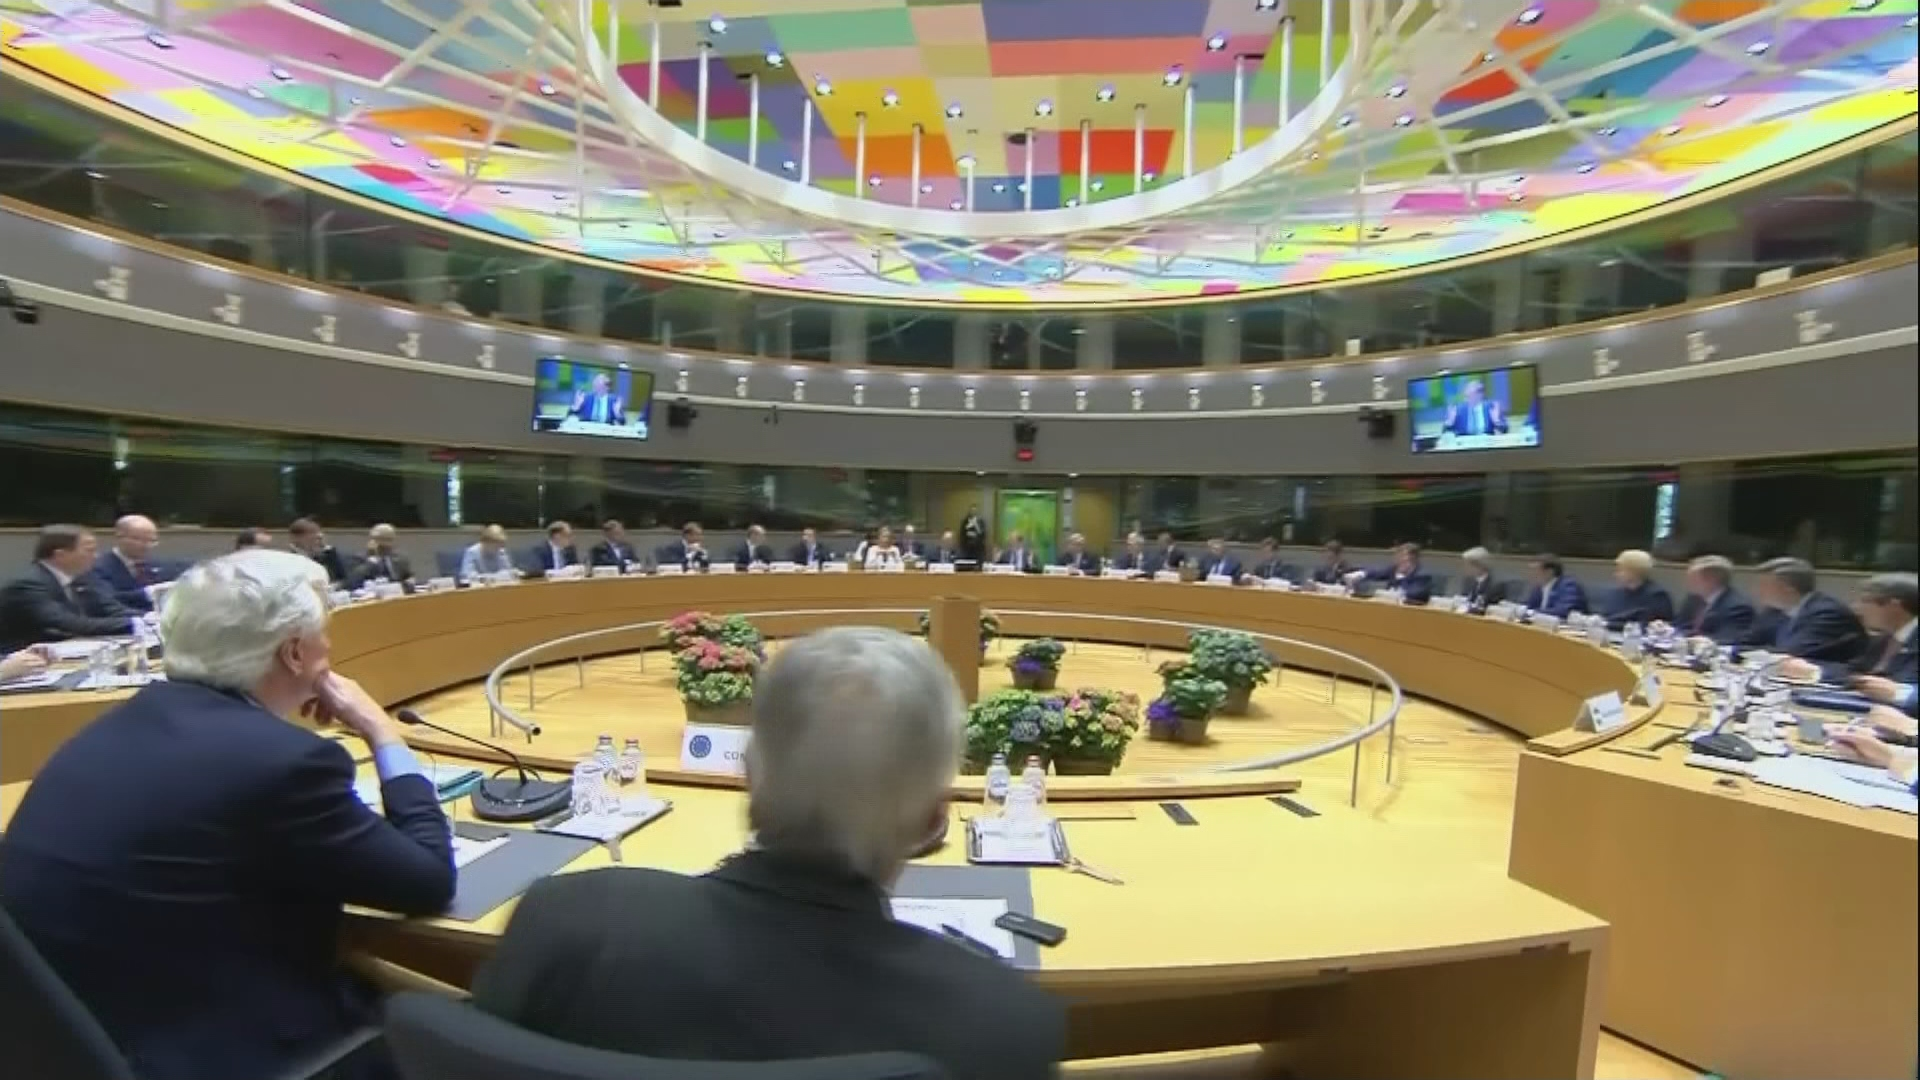 EU 27 LEADERS